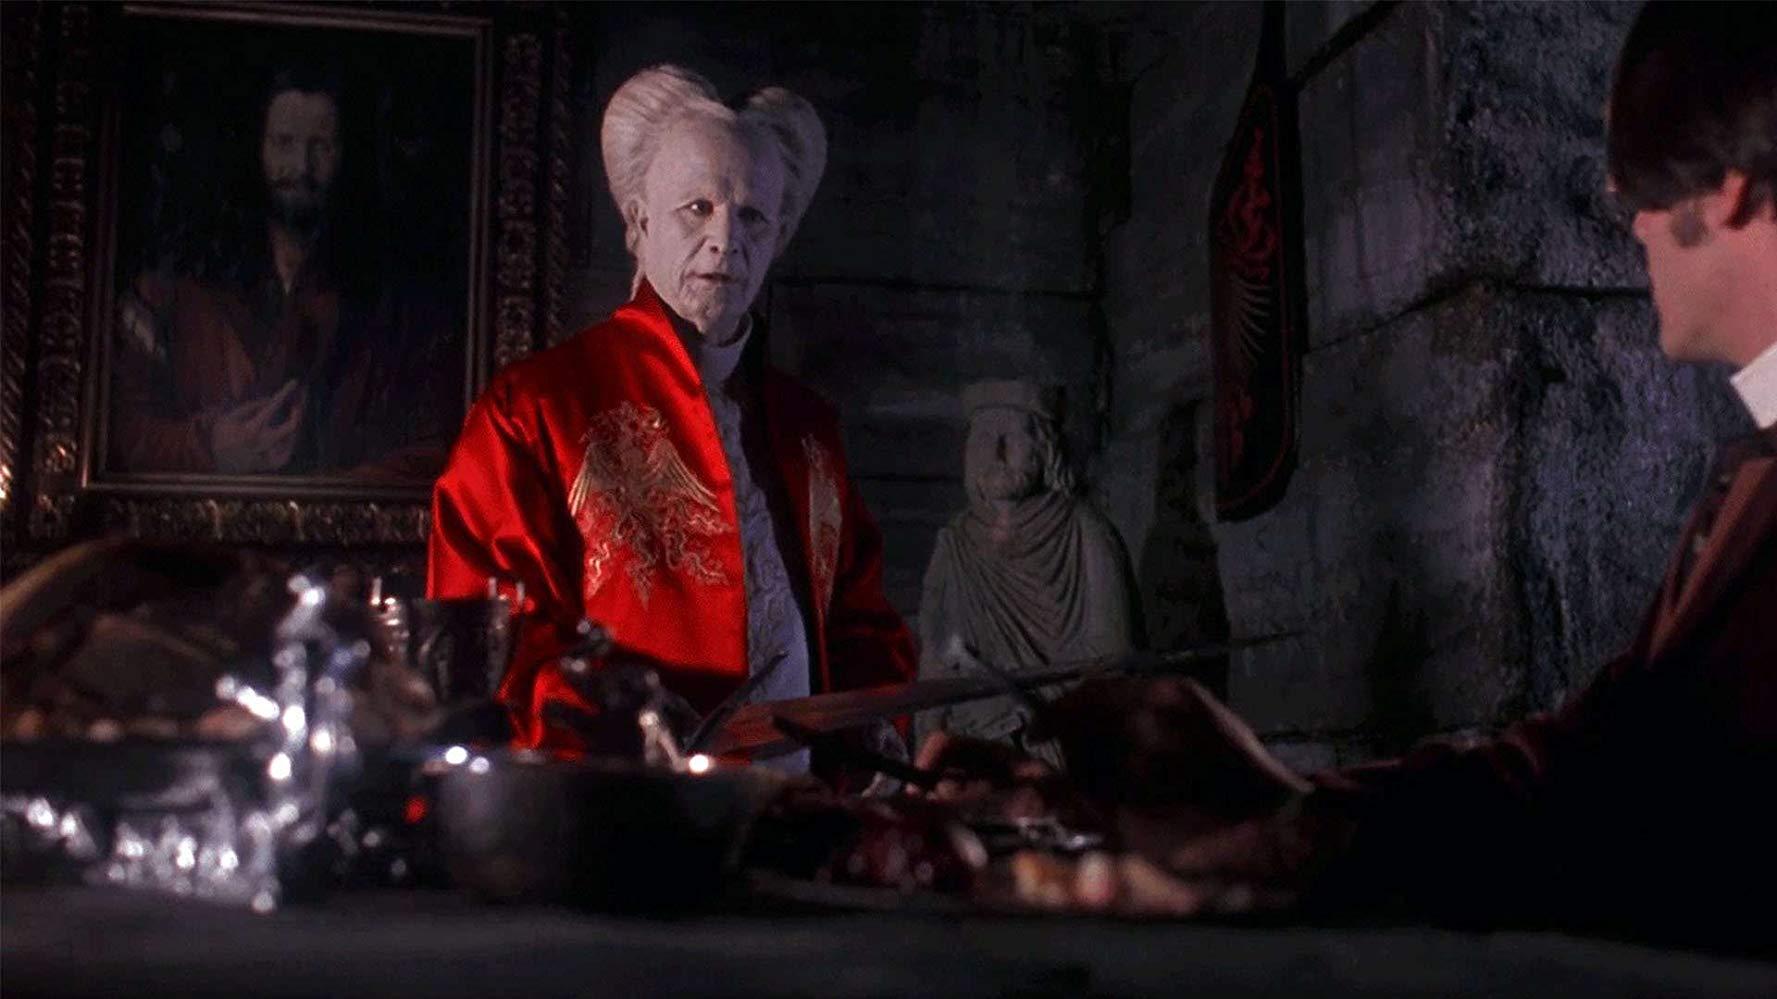 (l to r) Count Dracula (Gary Oldman) greets Jonathan Harker (Keanu Reeves) in Bram Stoker's Dracula (1992)